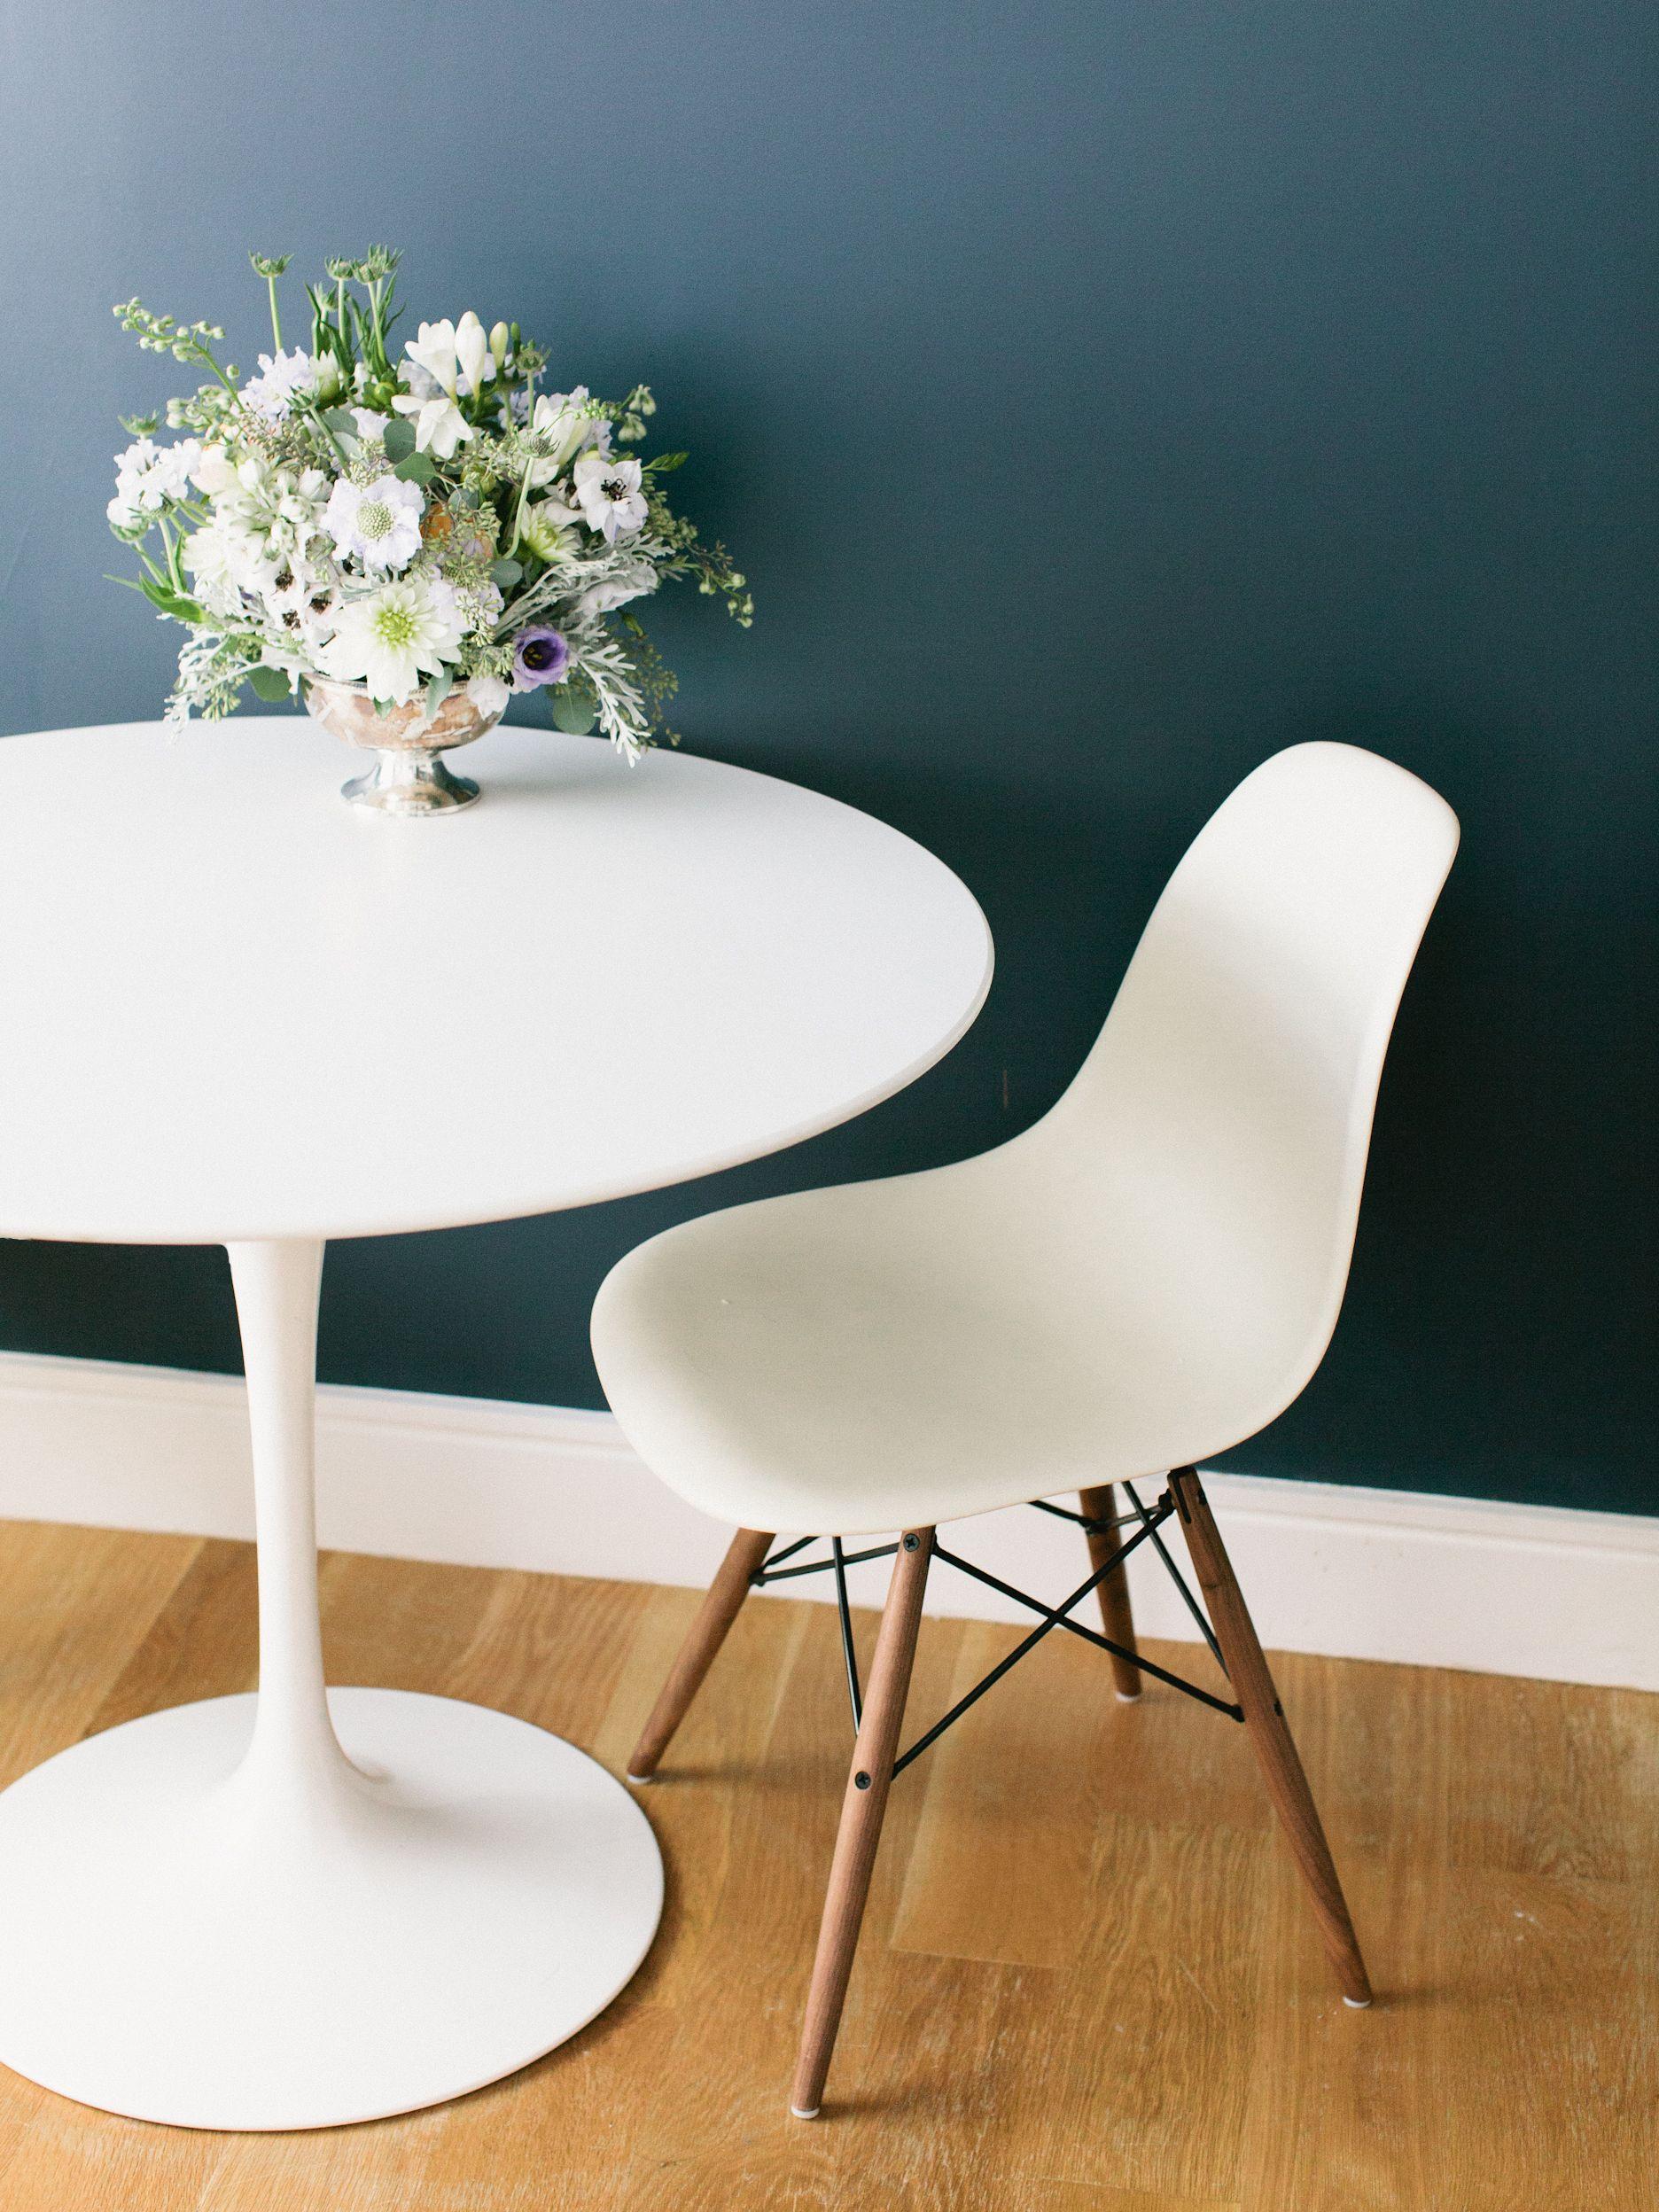 set de table polypropylene dark blue wall crisp white trim white saarinen tulip